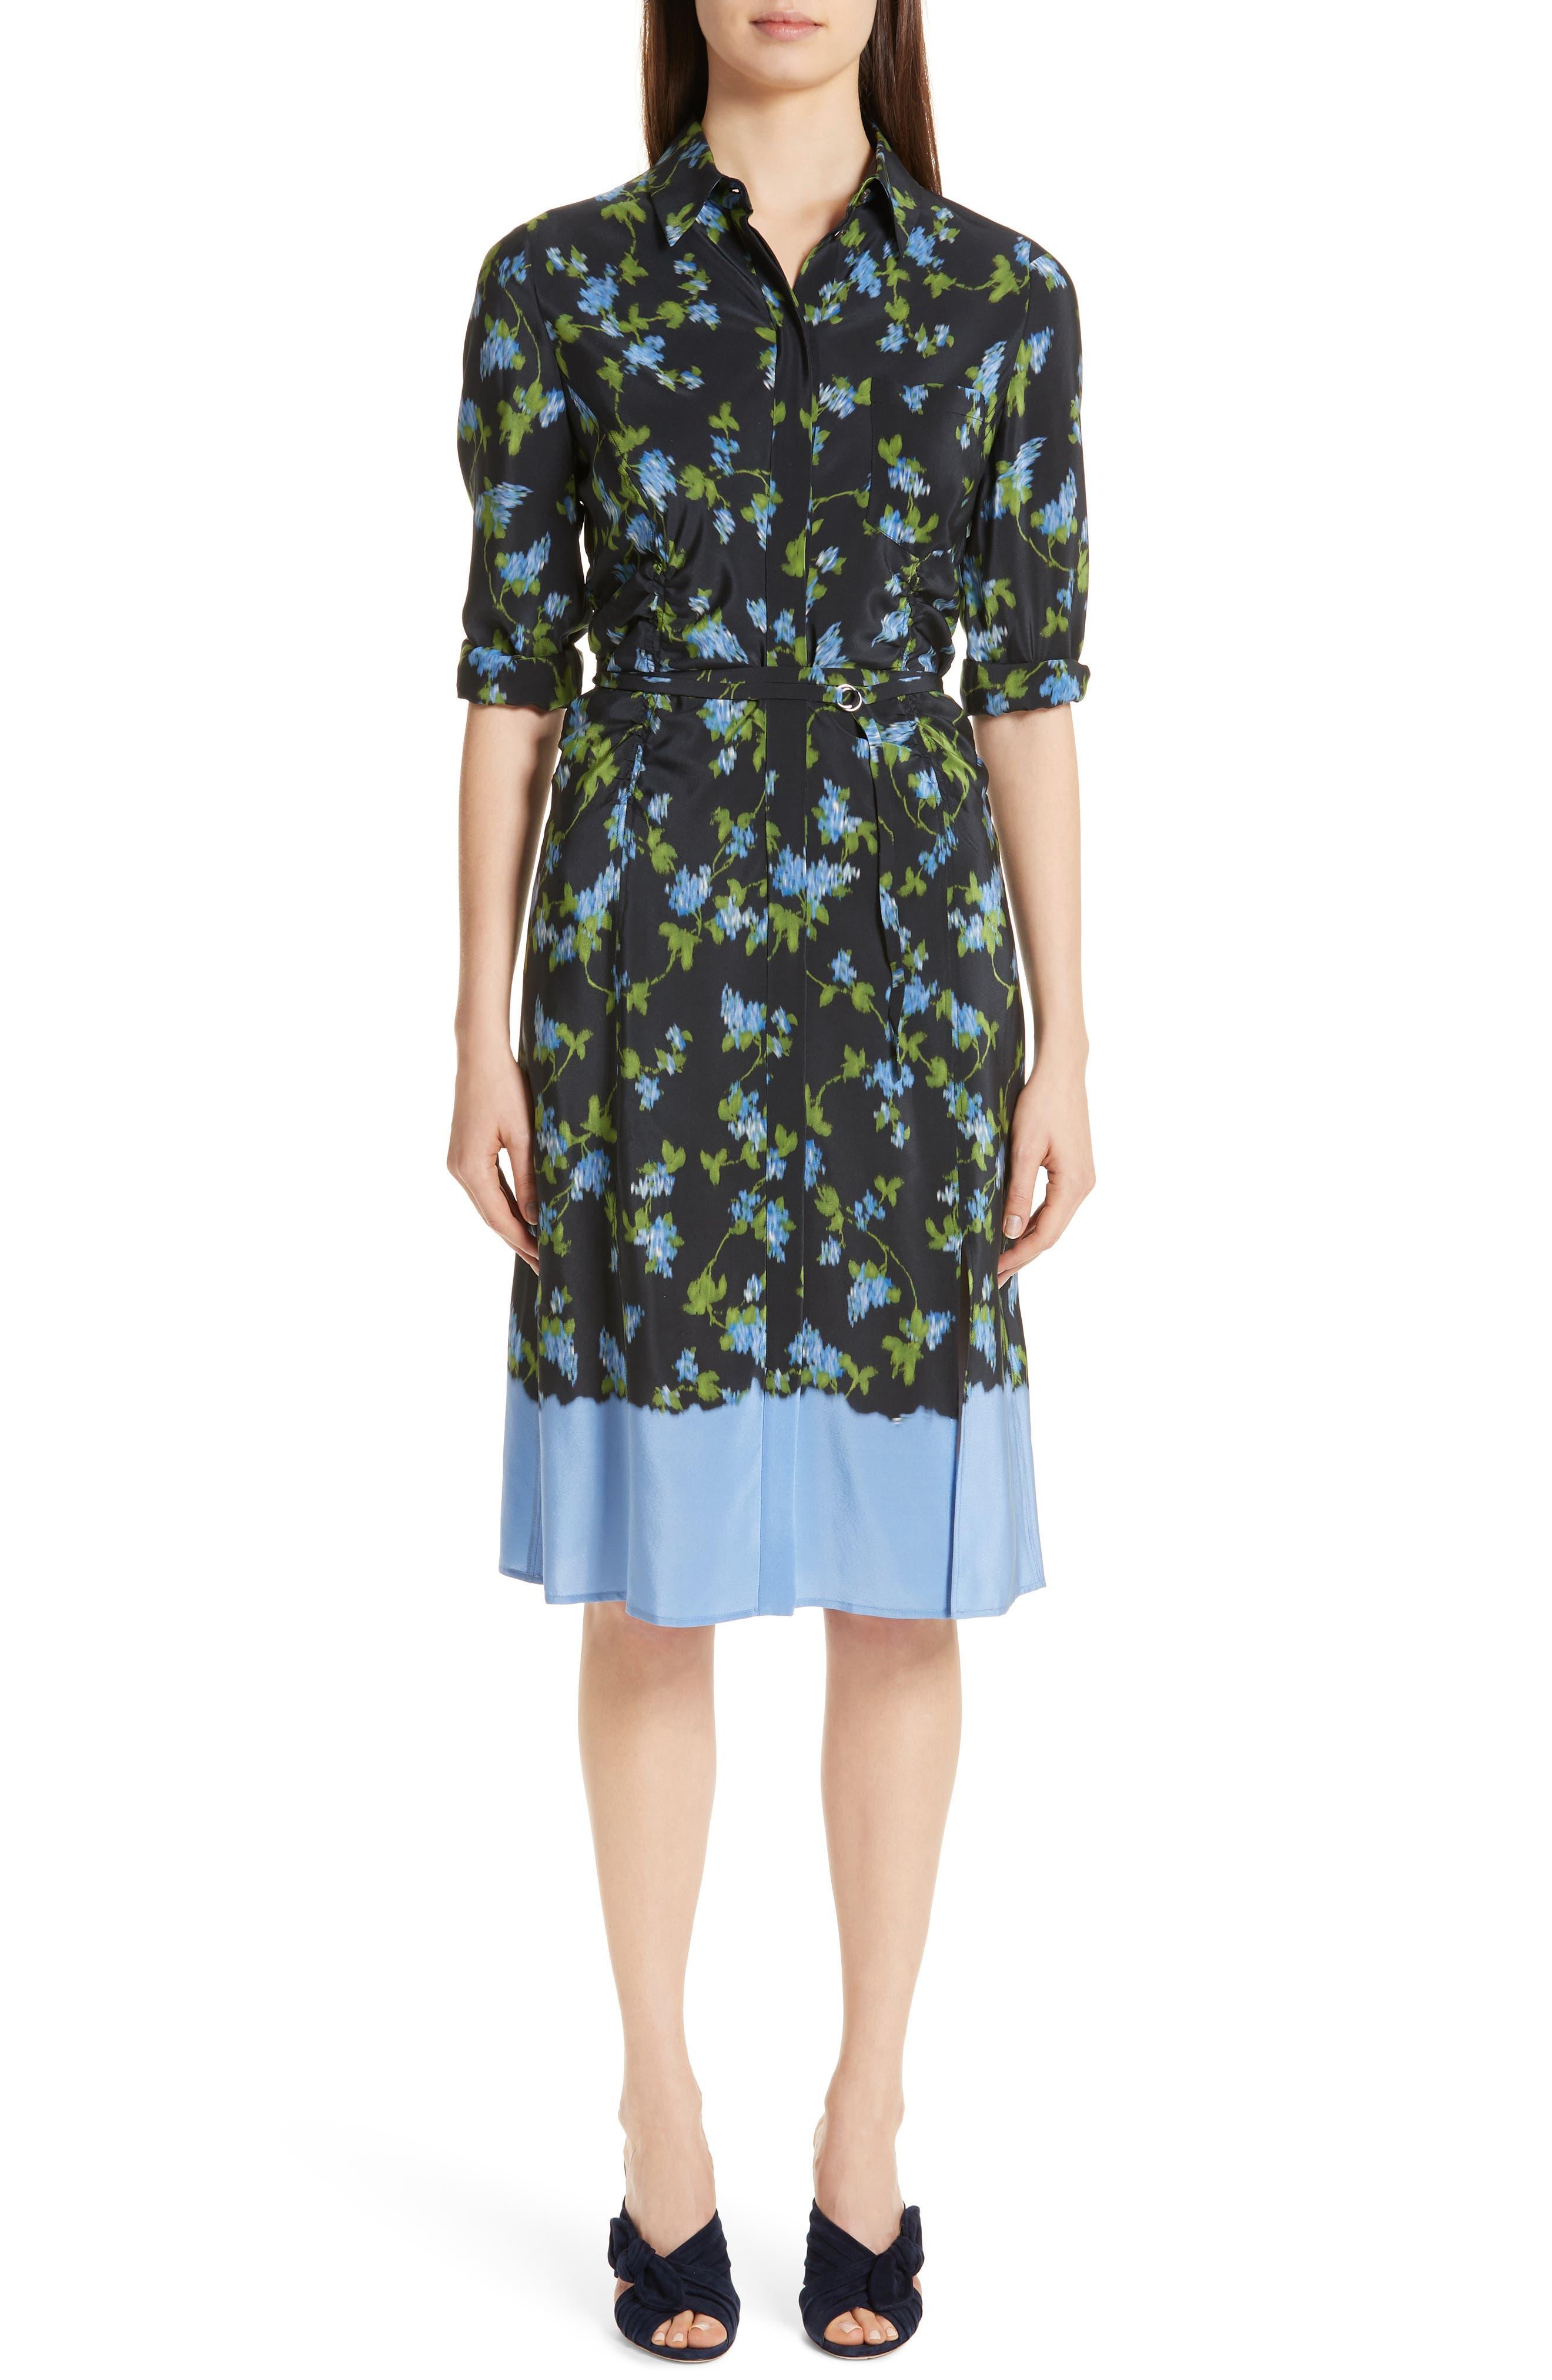 ALTUZARRA, Floral Print Silk Dress, Main thumbnail 1, color, BLACK